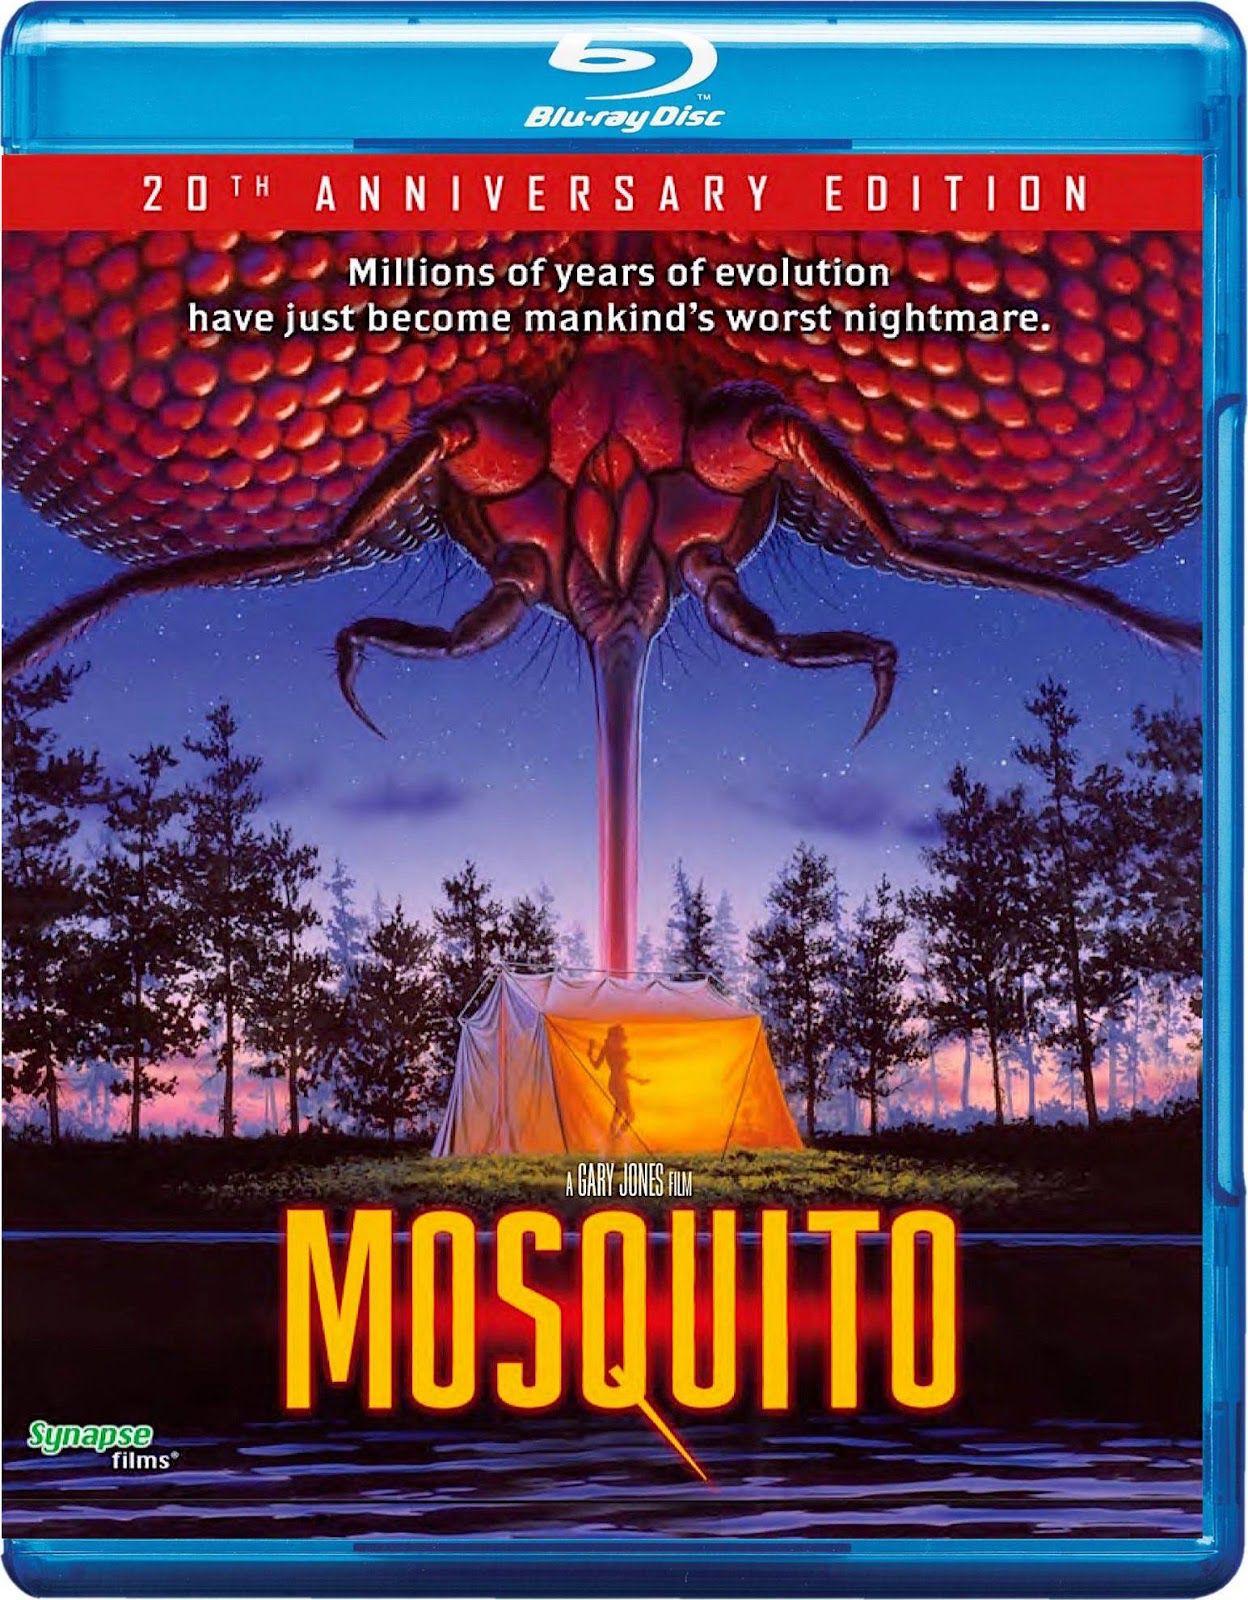 MOSQUITO 20TH ANNIVERSARY EDITION SYNAPSE FILMS BLURAY